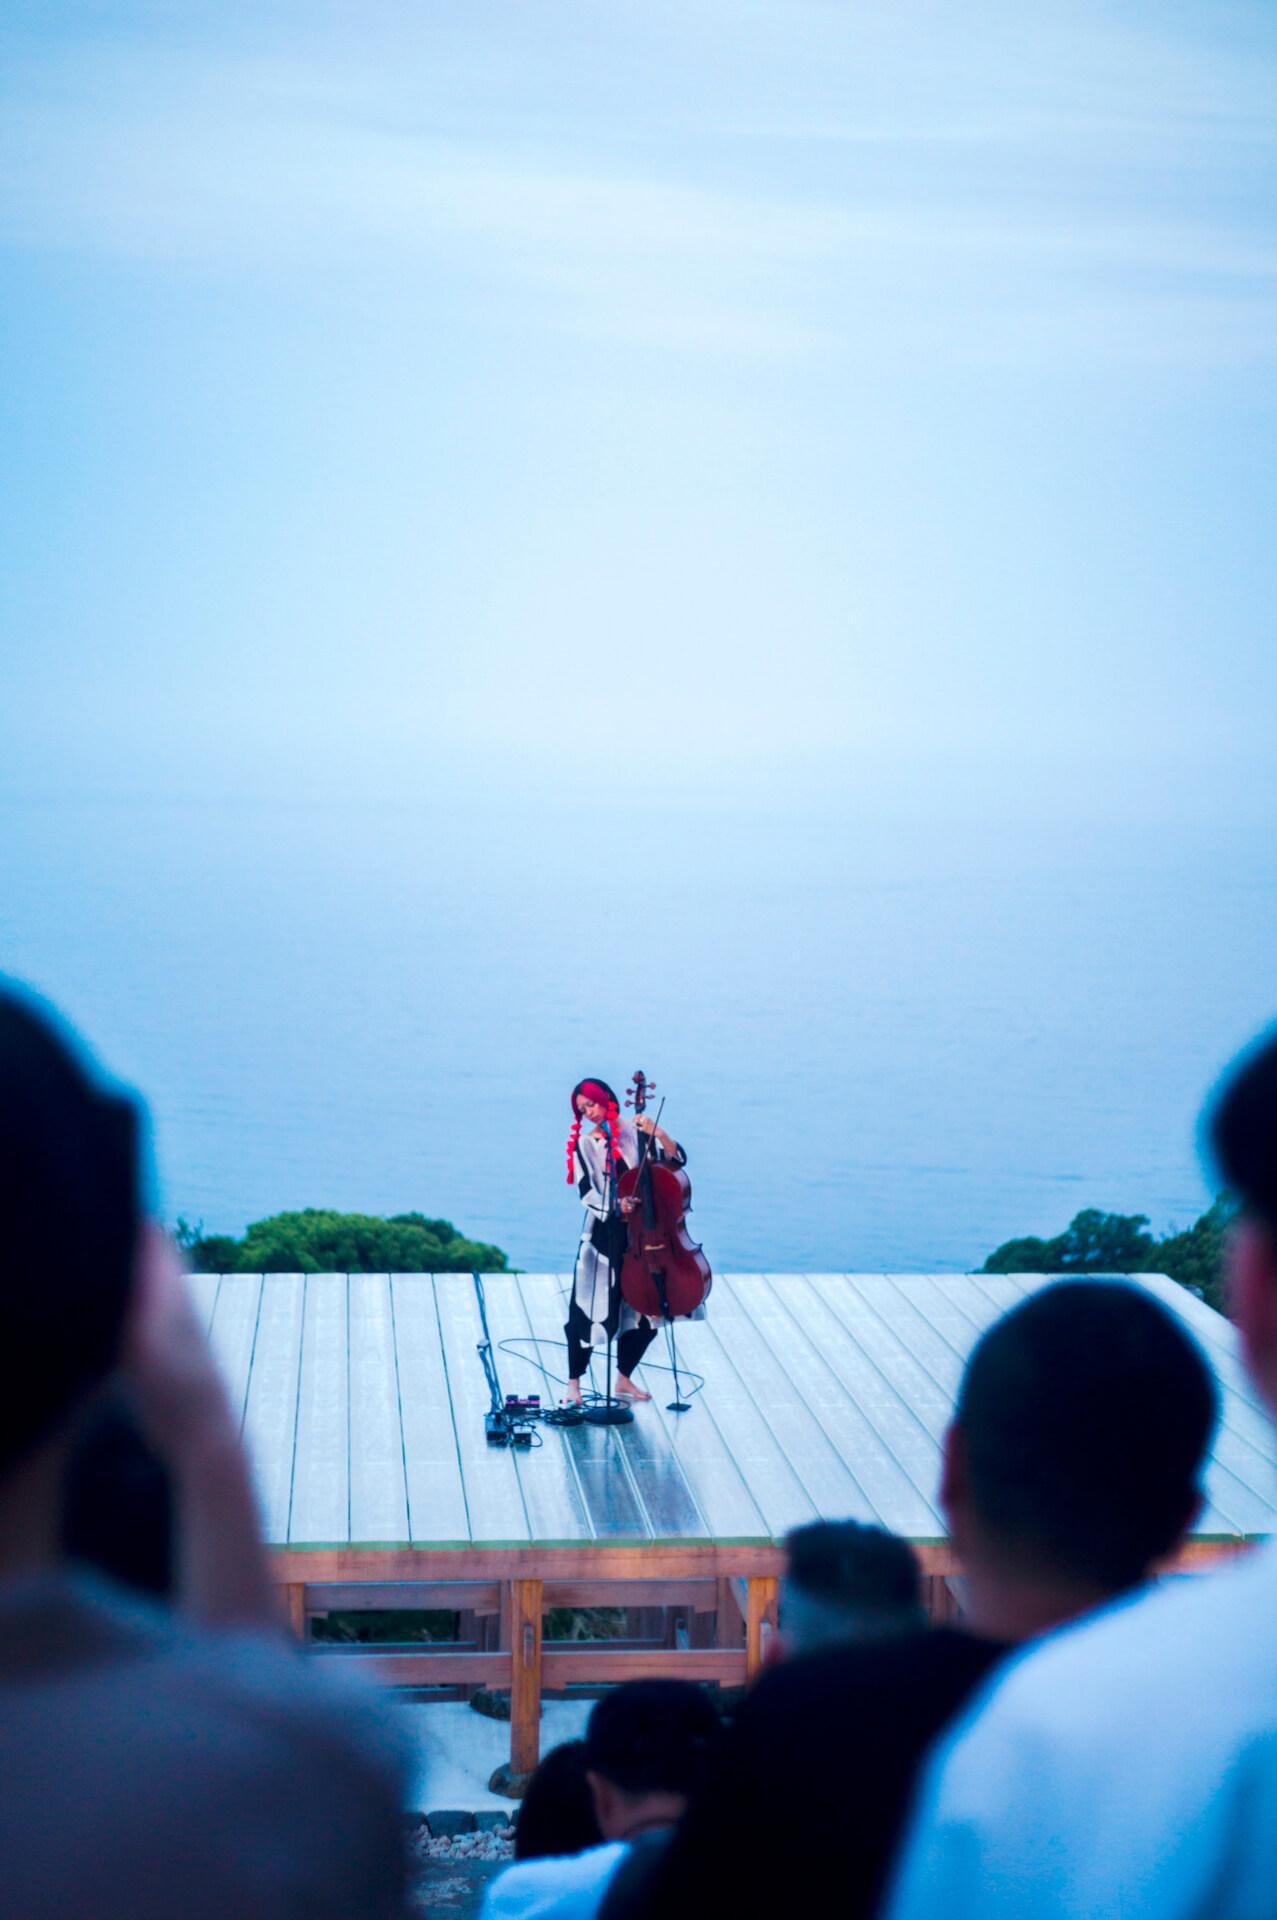 Kelsey Lu ライヴ・レポート 小田原文化財団/江之浦測候所で日没に向かうたった50分の間に見せた奇跡 music190529-kelsey-lu-report-2